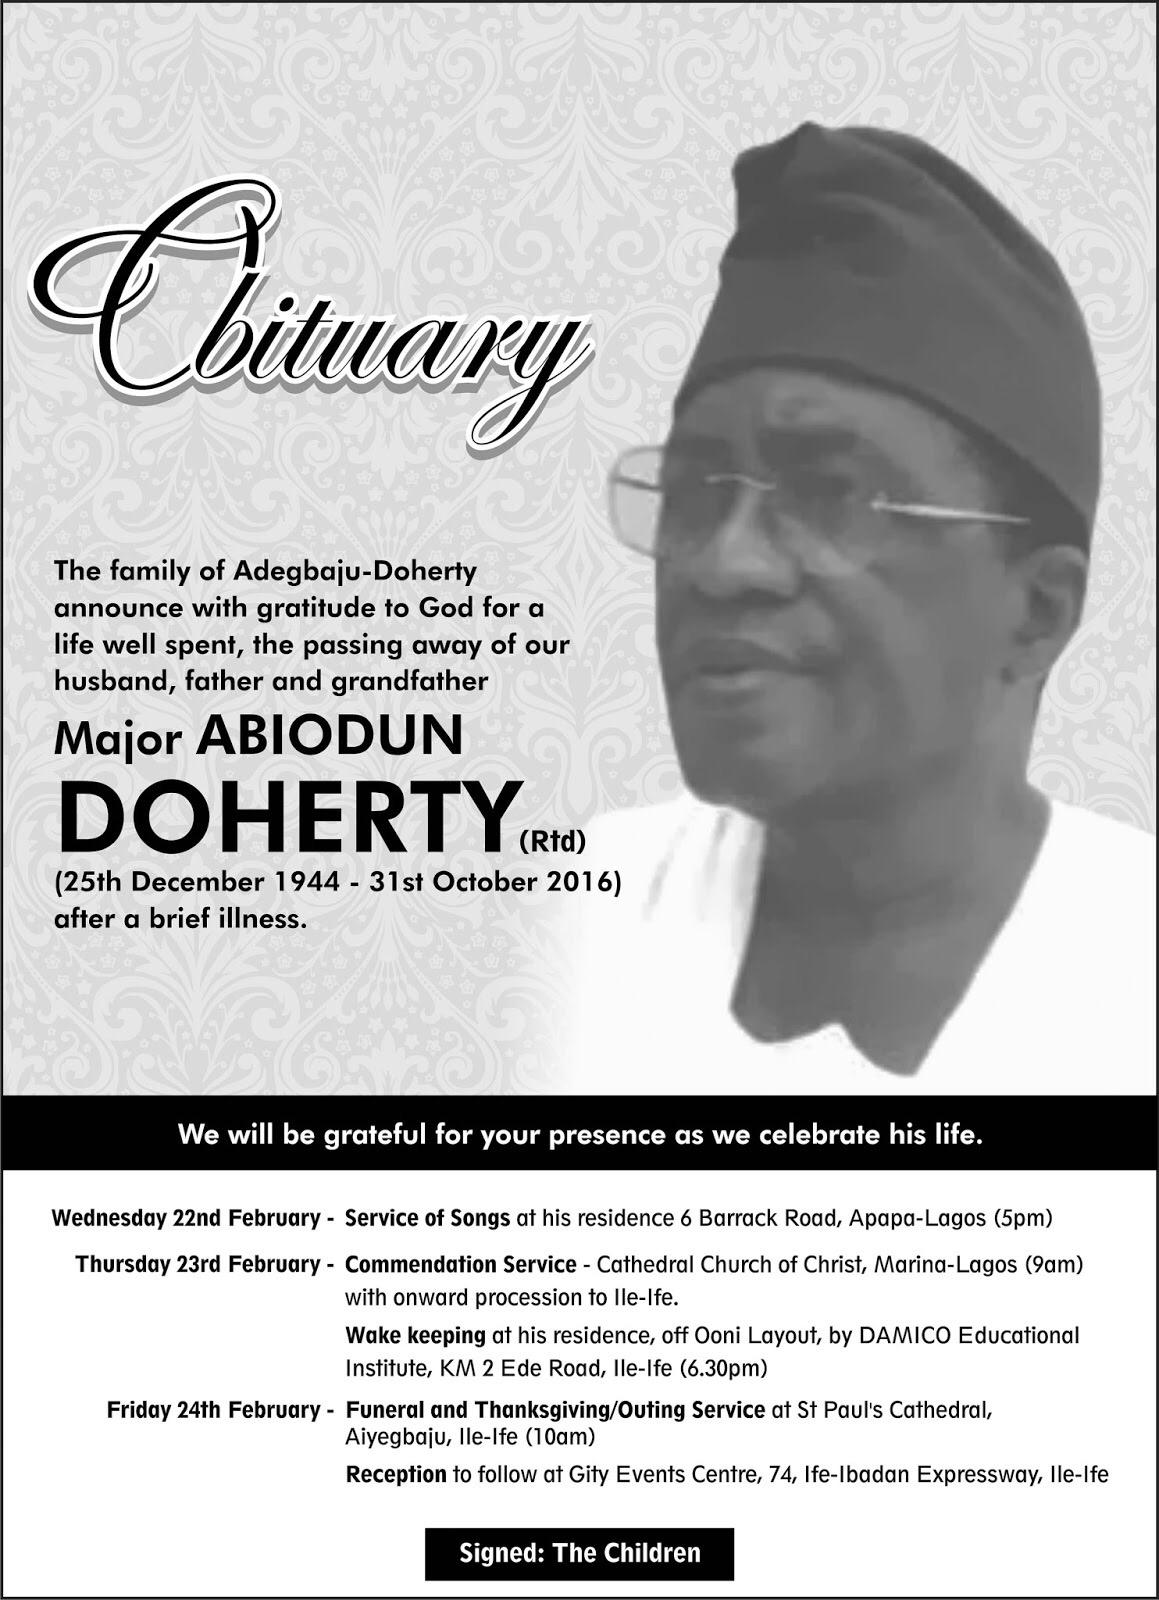 OBITUARY: Major Abiodun Doherty (Rtd)